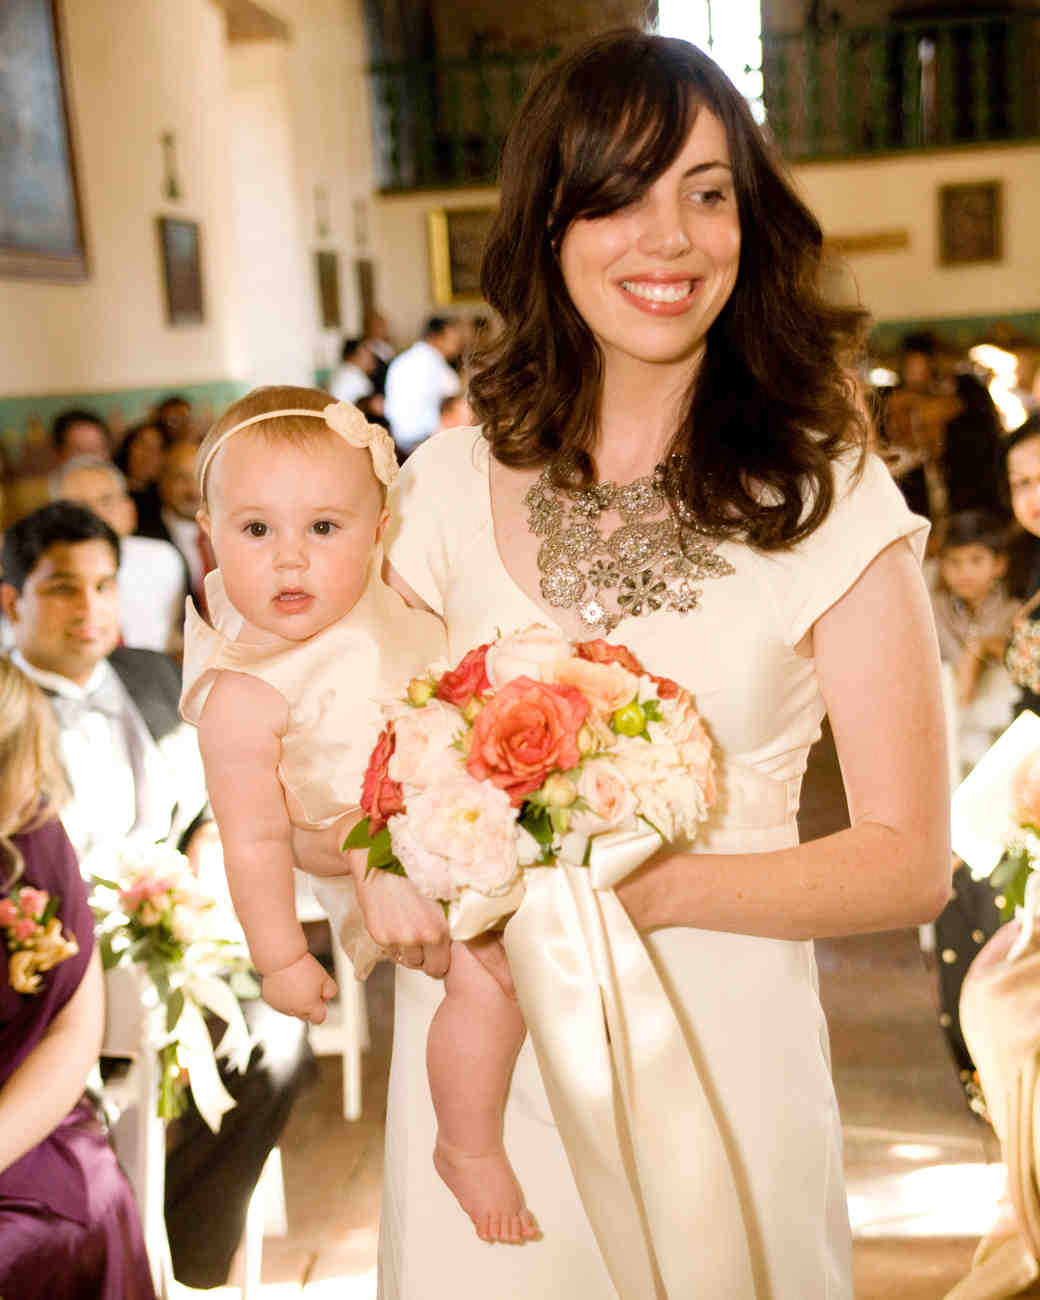 real-weddings-gairu-daniel-0611ph152.jpg